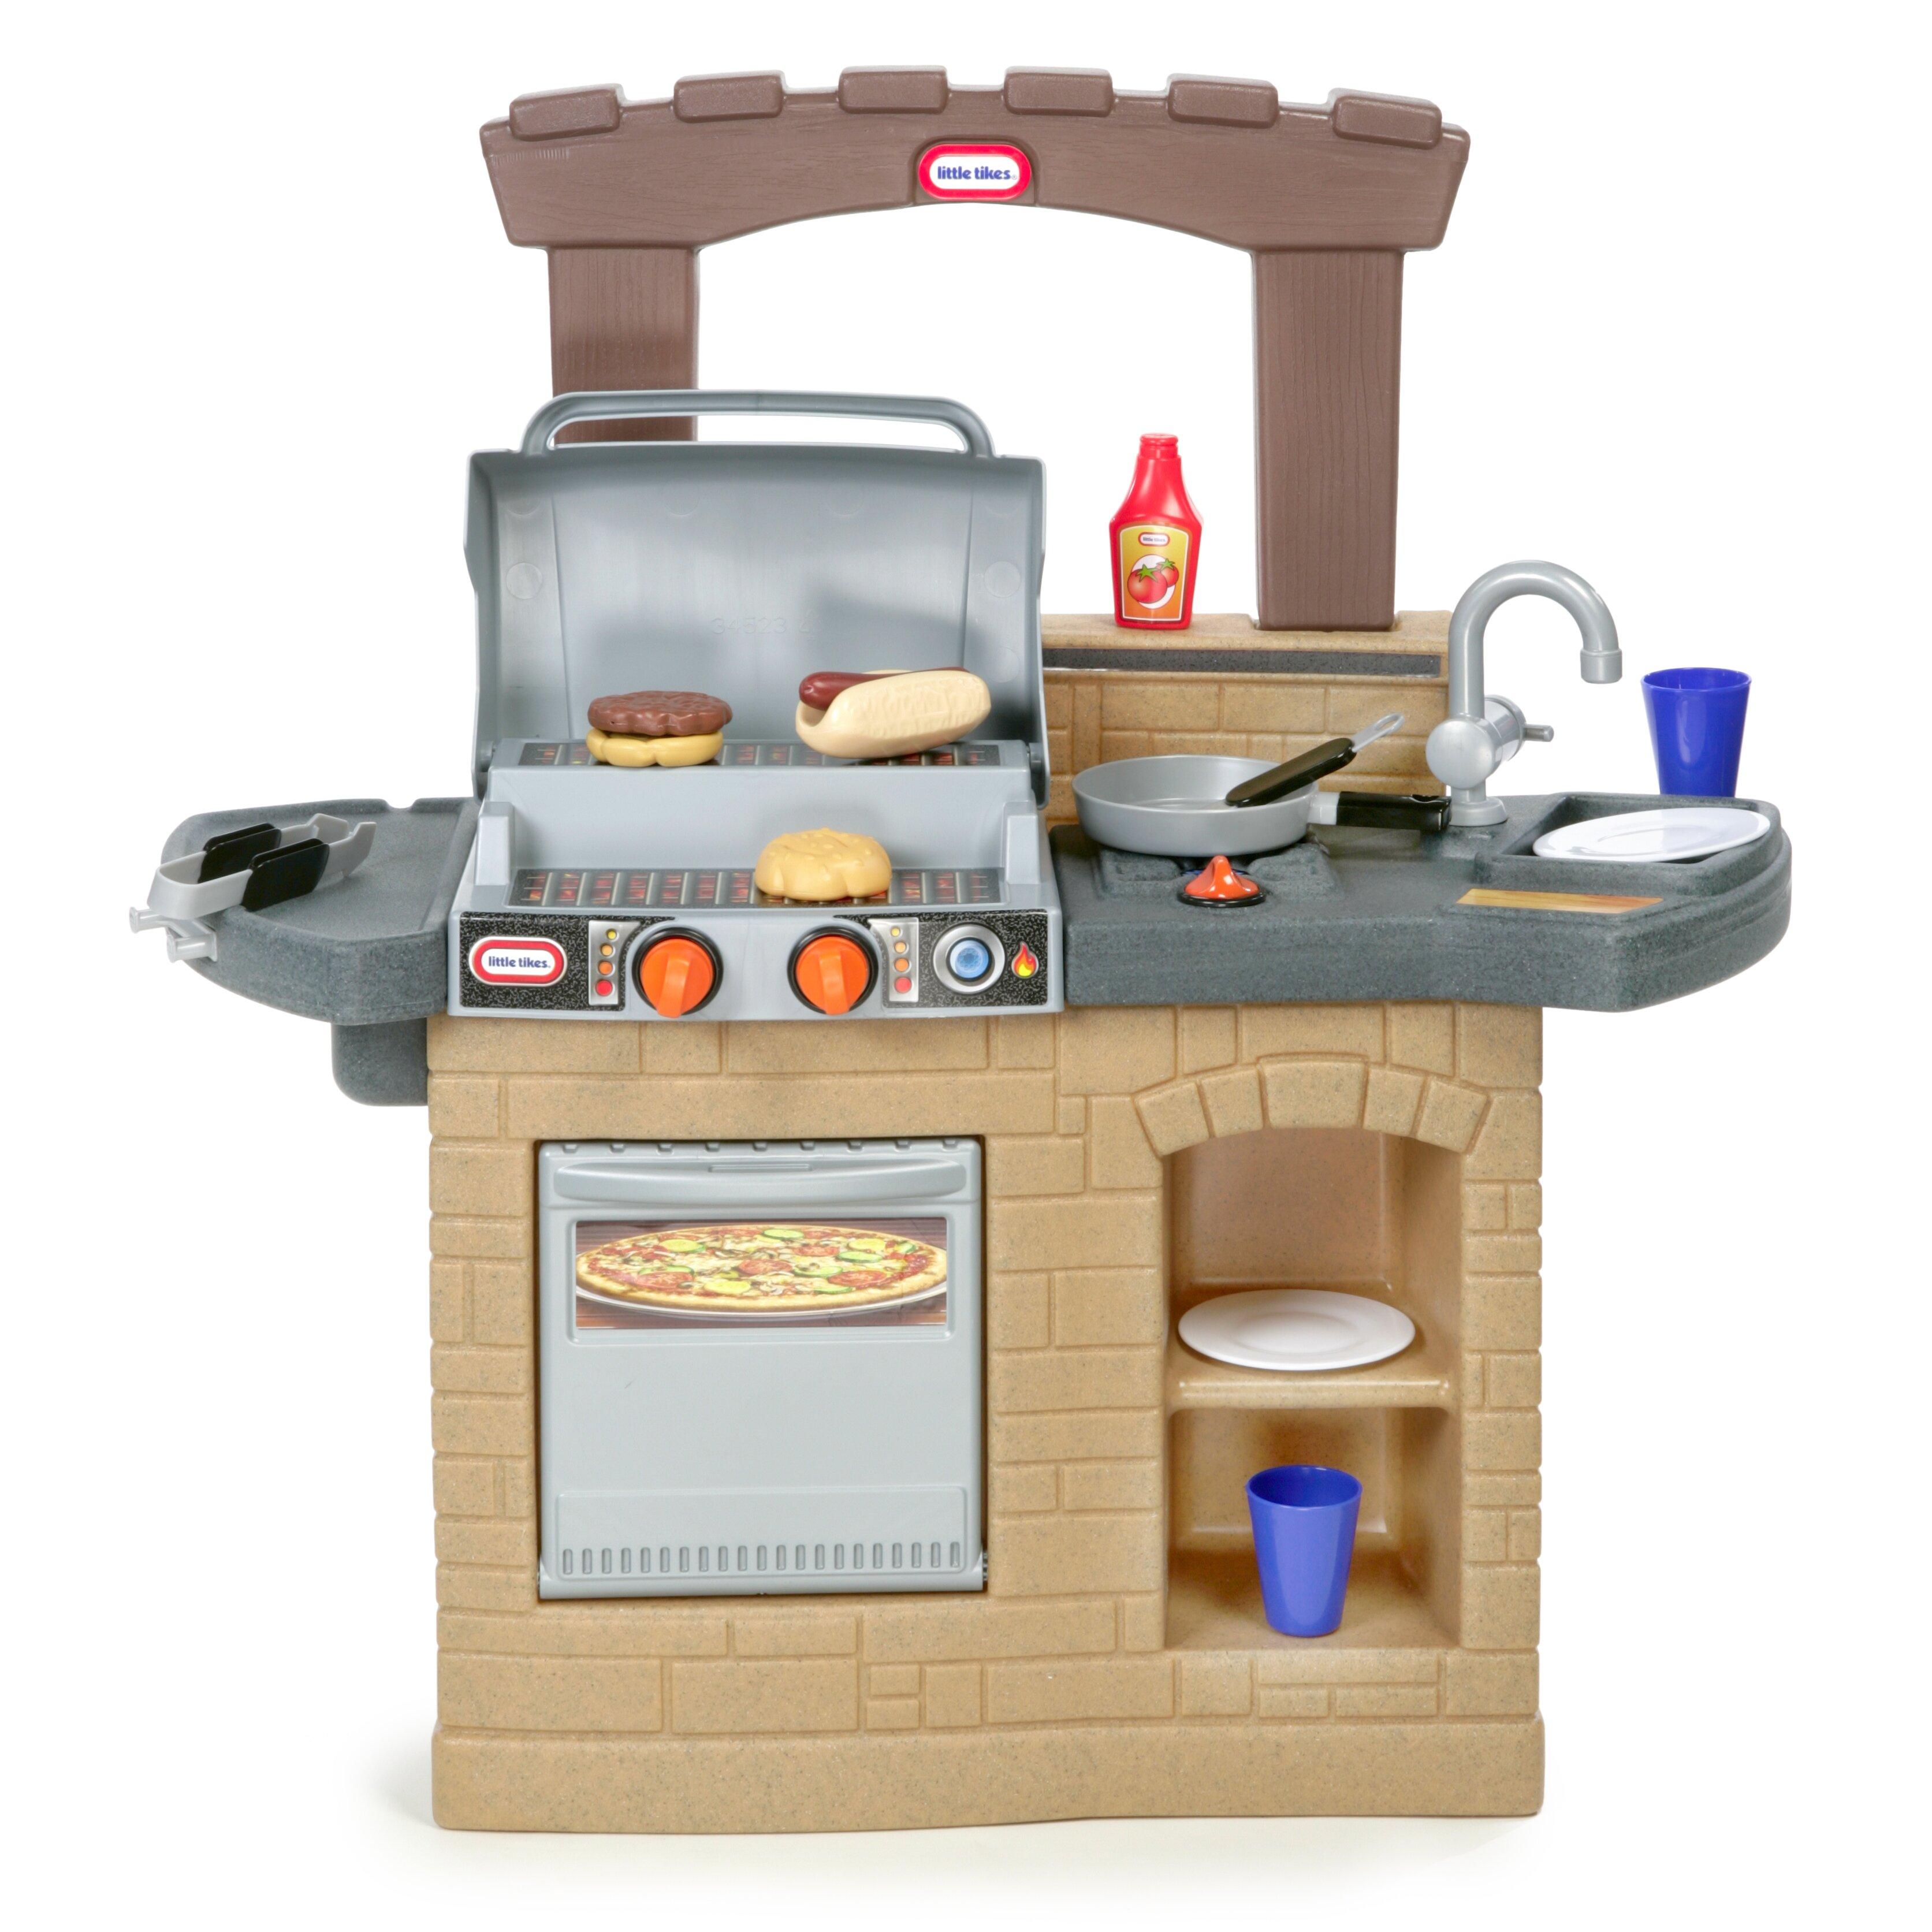 Upc 050743627545 Little Tikes Discoversounds Kitchen Upcitemdbcom Country Lathrop Ca